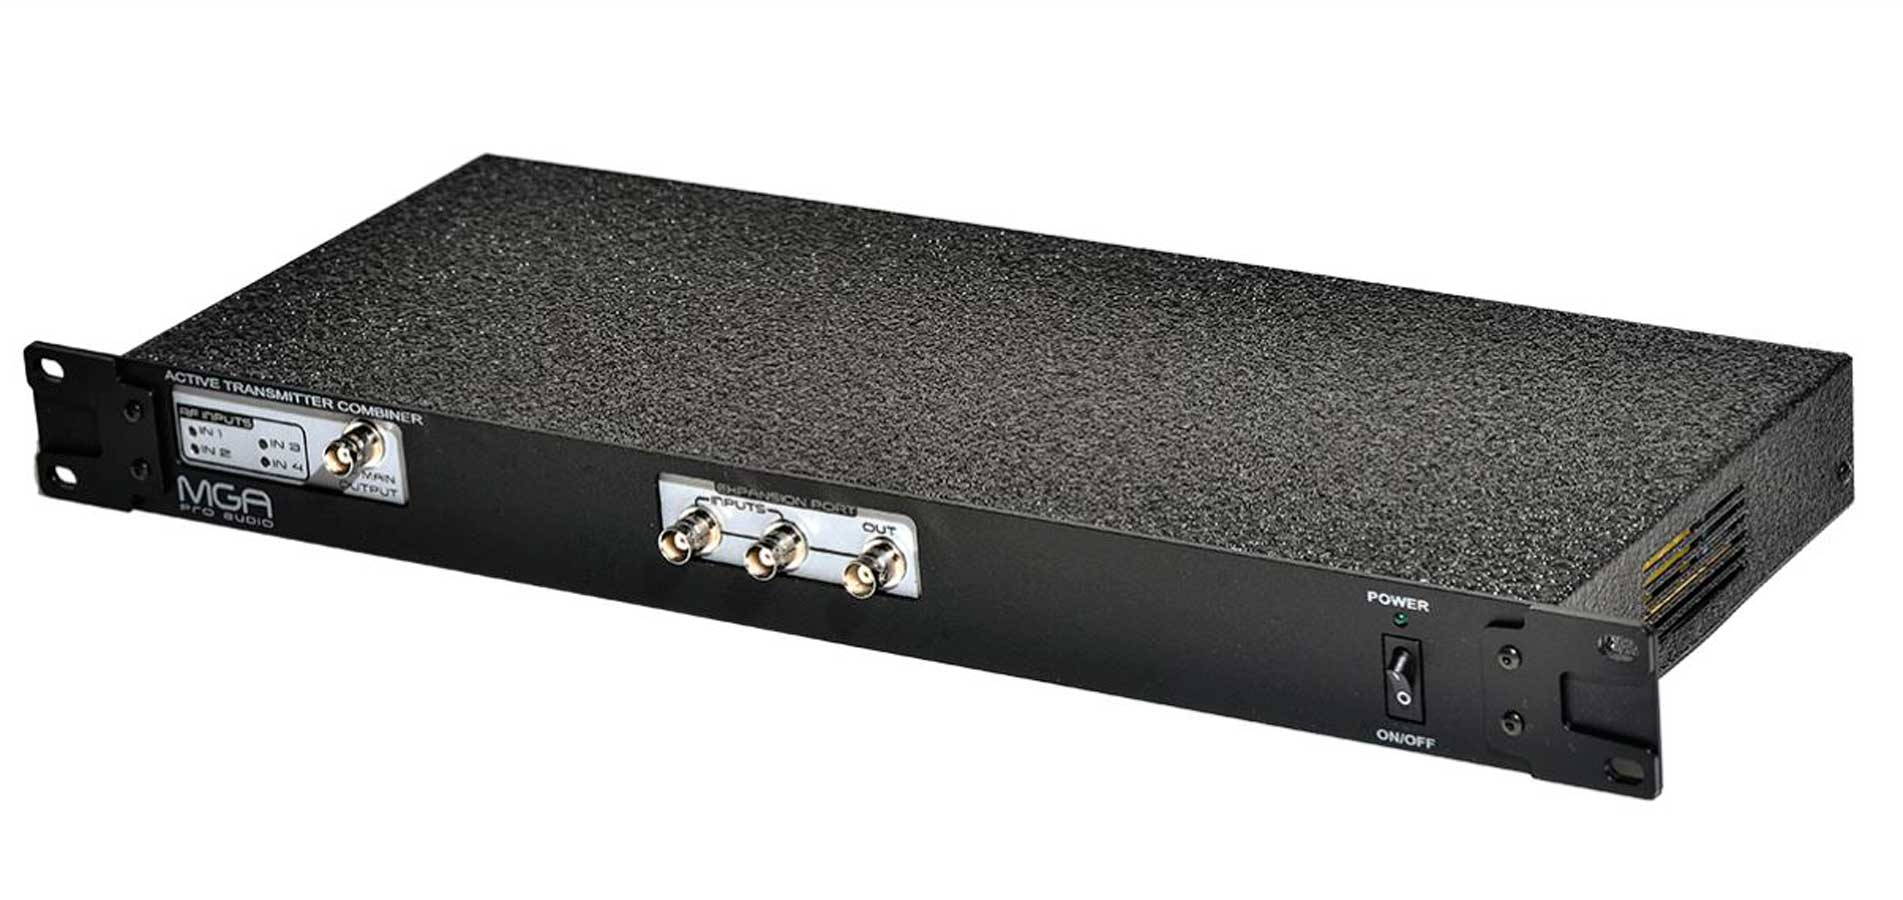 Combiner para 4 transmissores IEM e 1 antena sem perda | 470 ~ 870 MHz | MGA Pro Audio | UC-442